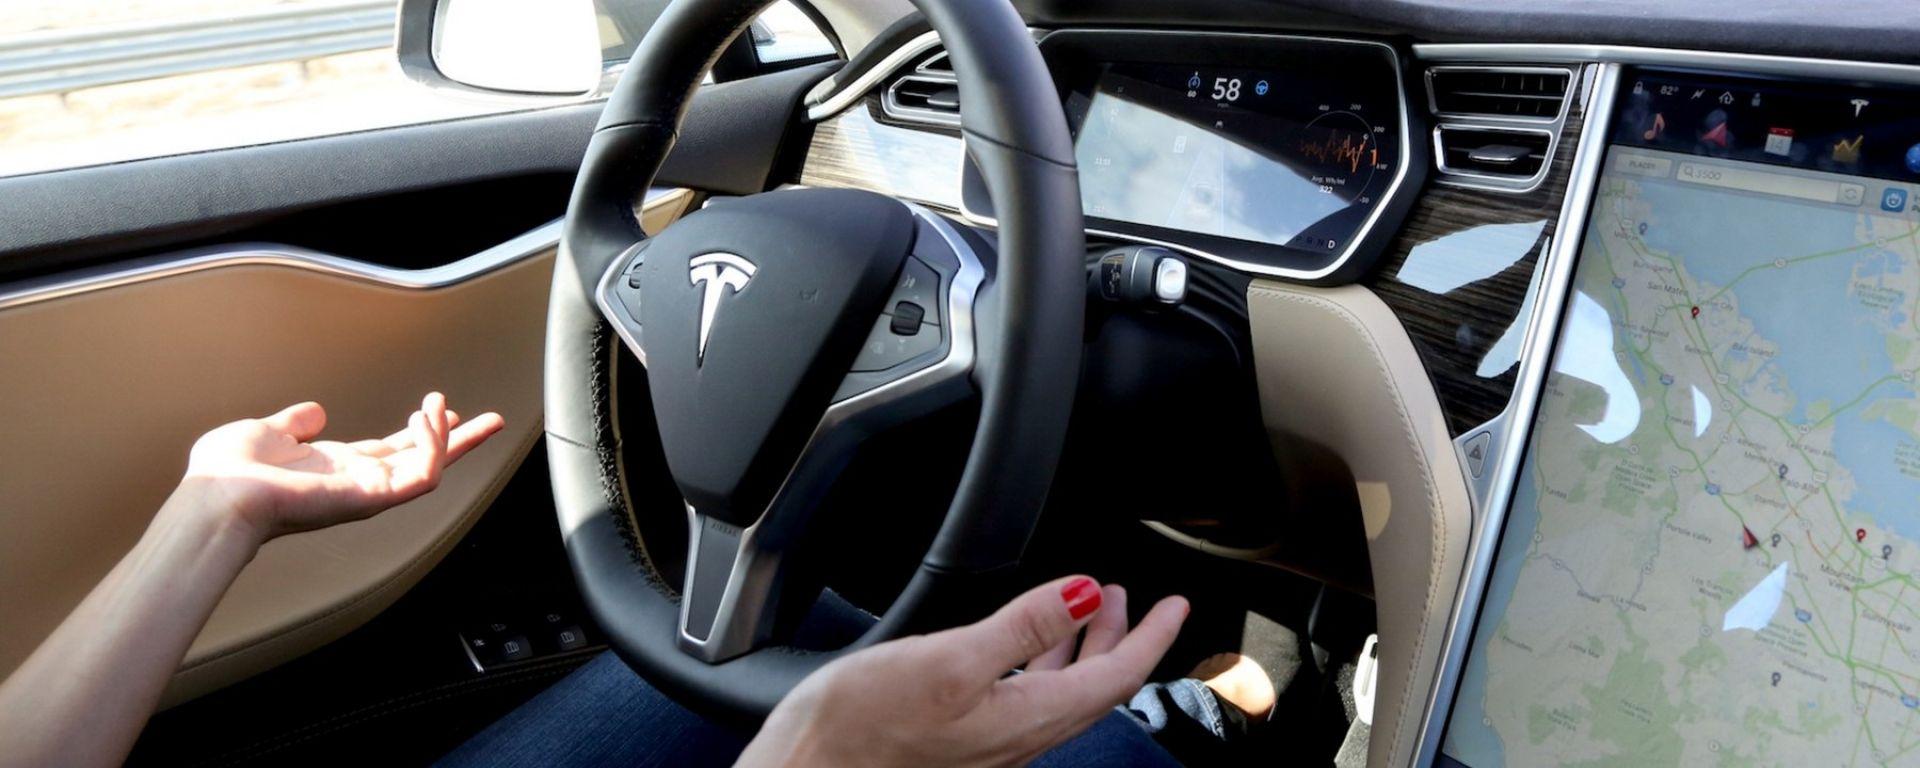 Tesla Autopilot all'opera